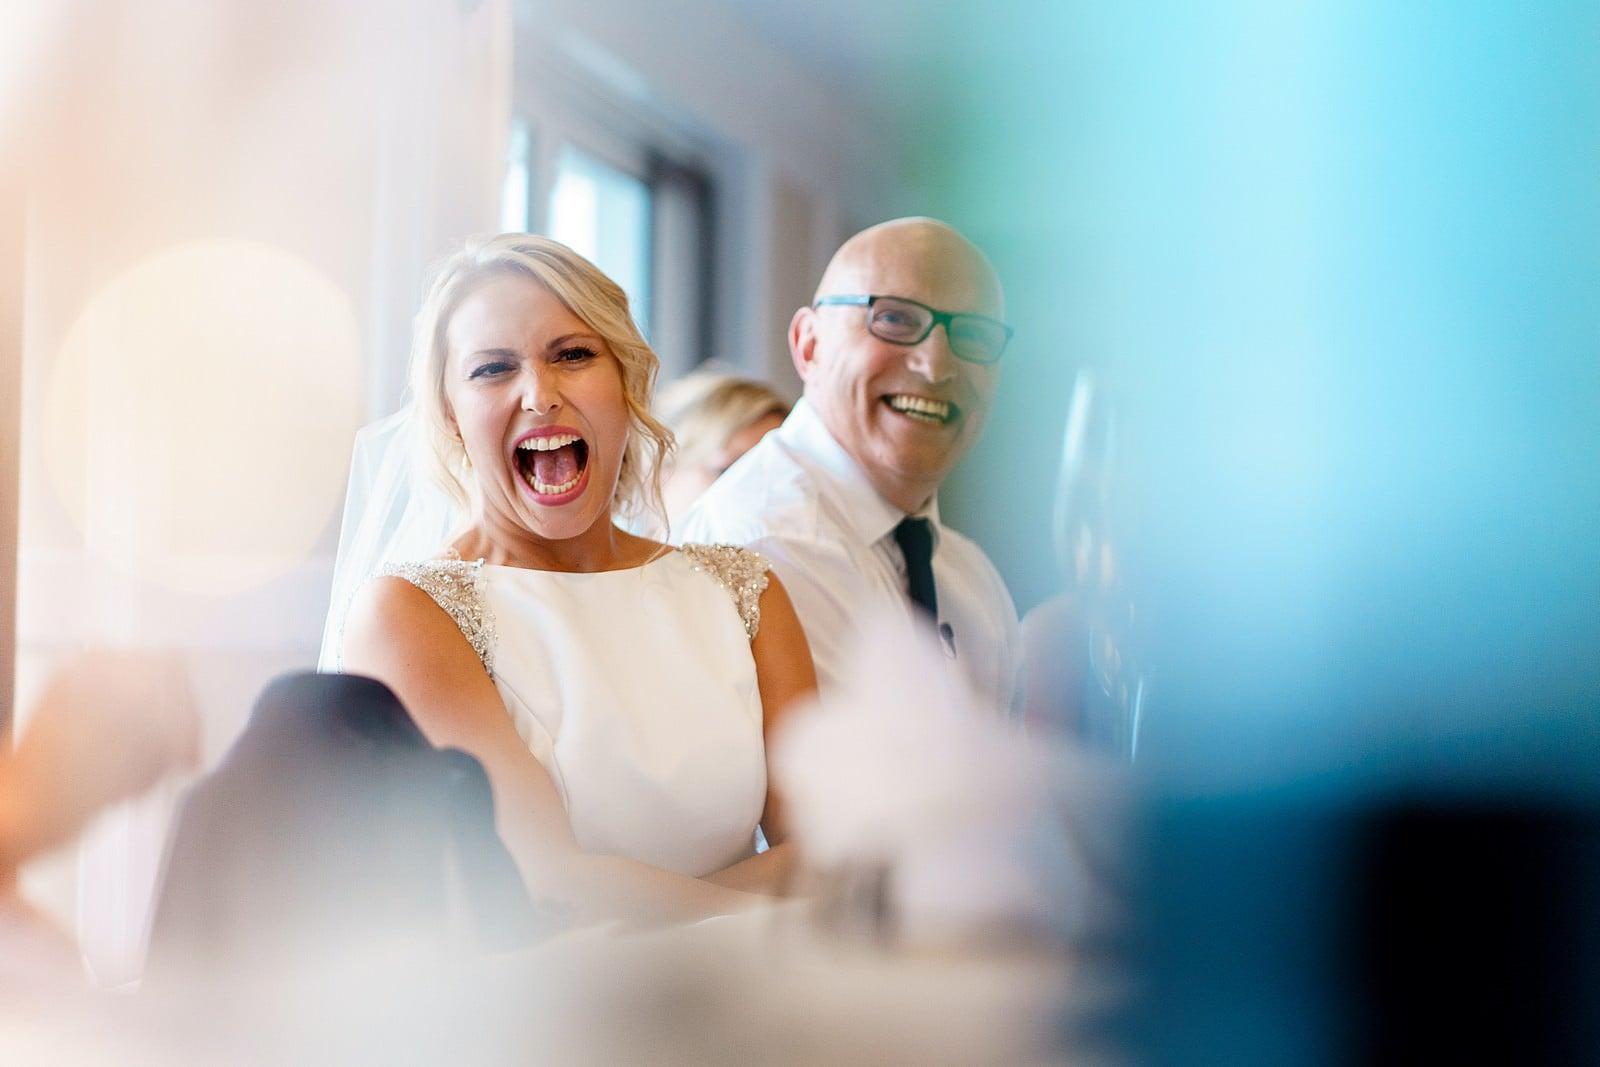 documentary wedding photography at the greenbank hotel